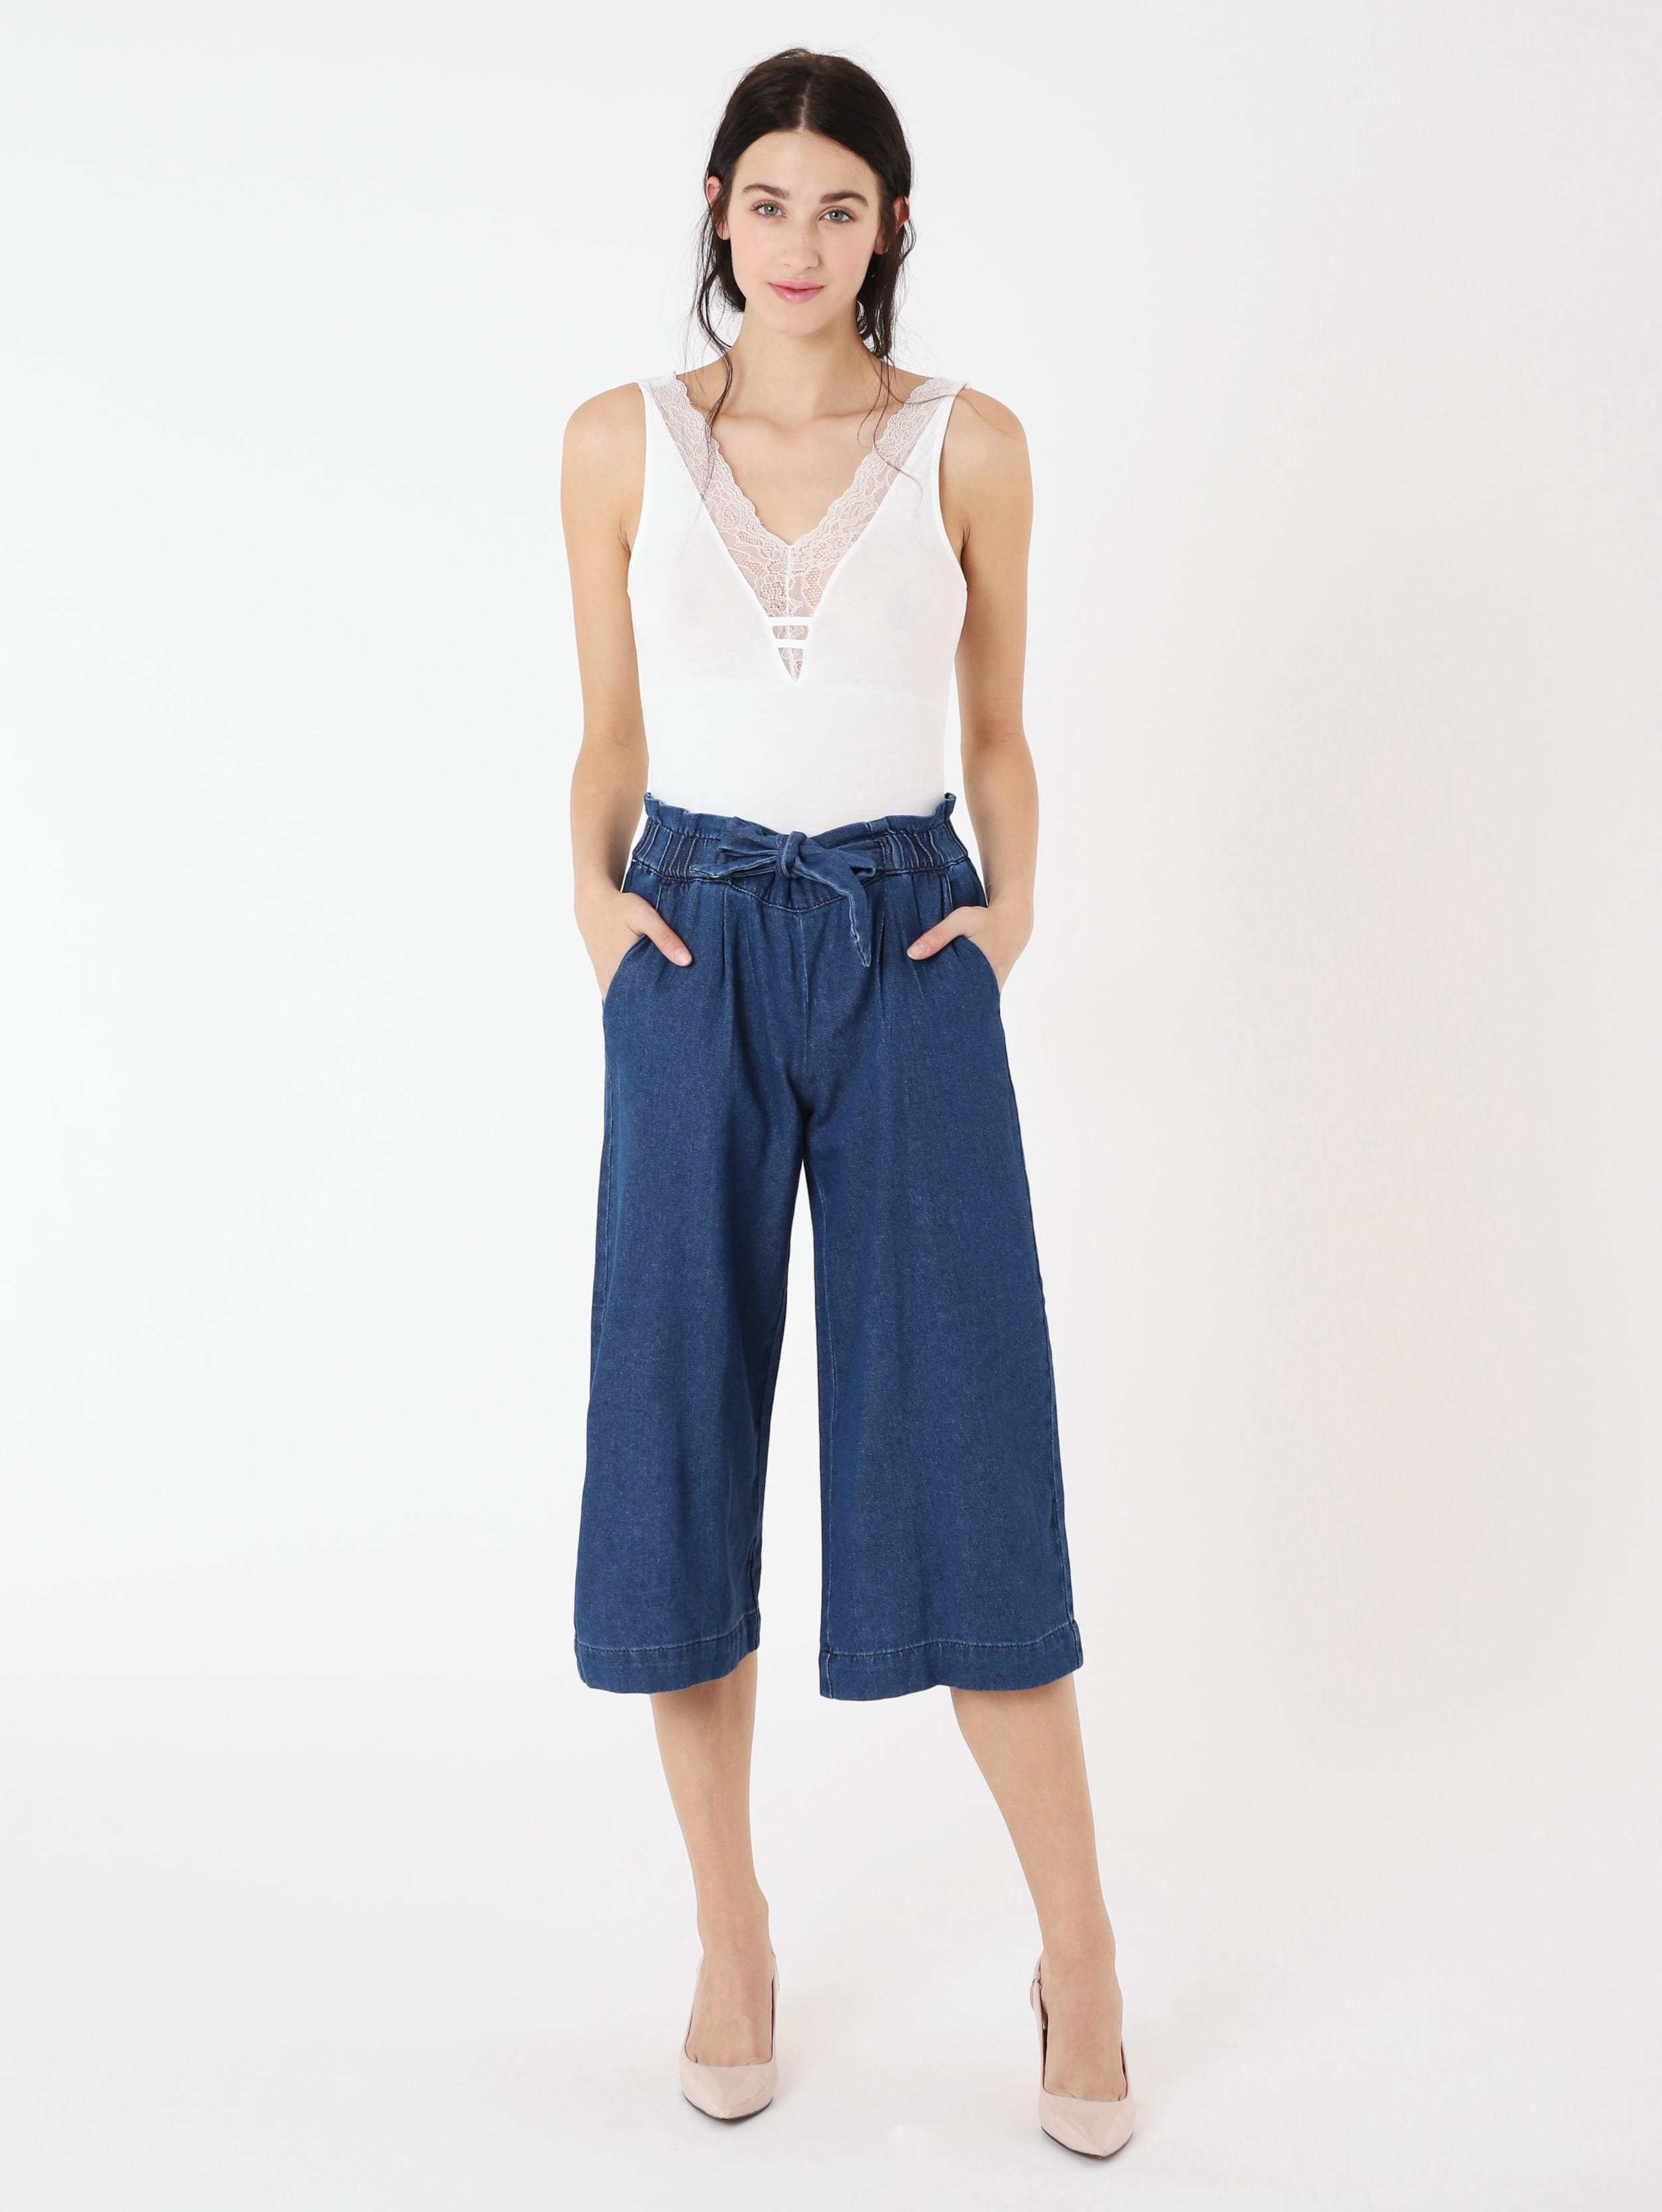 Jeans larghi paper bag Terranova a 29,99 euro